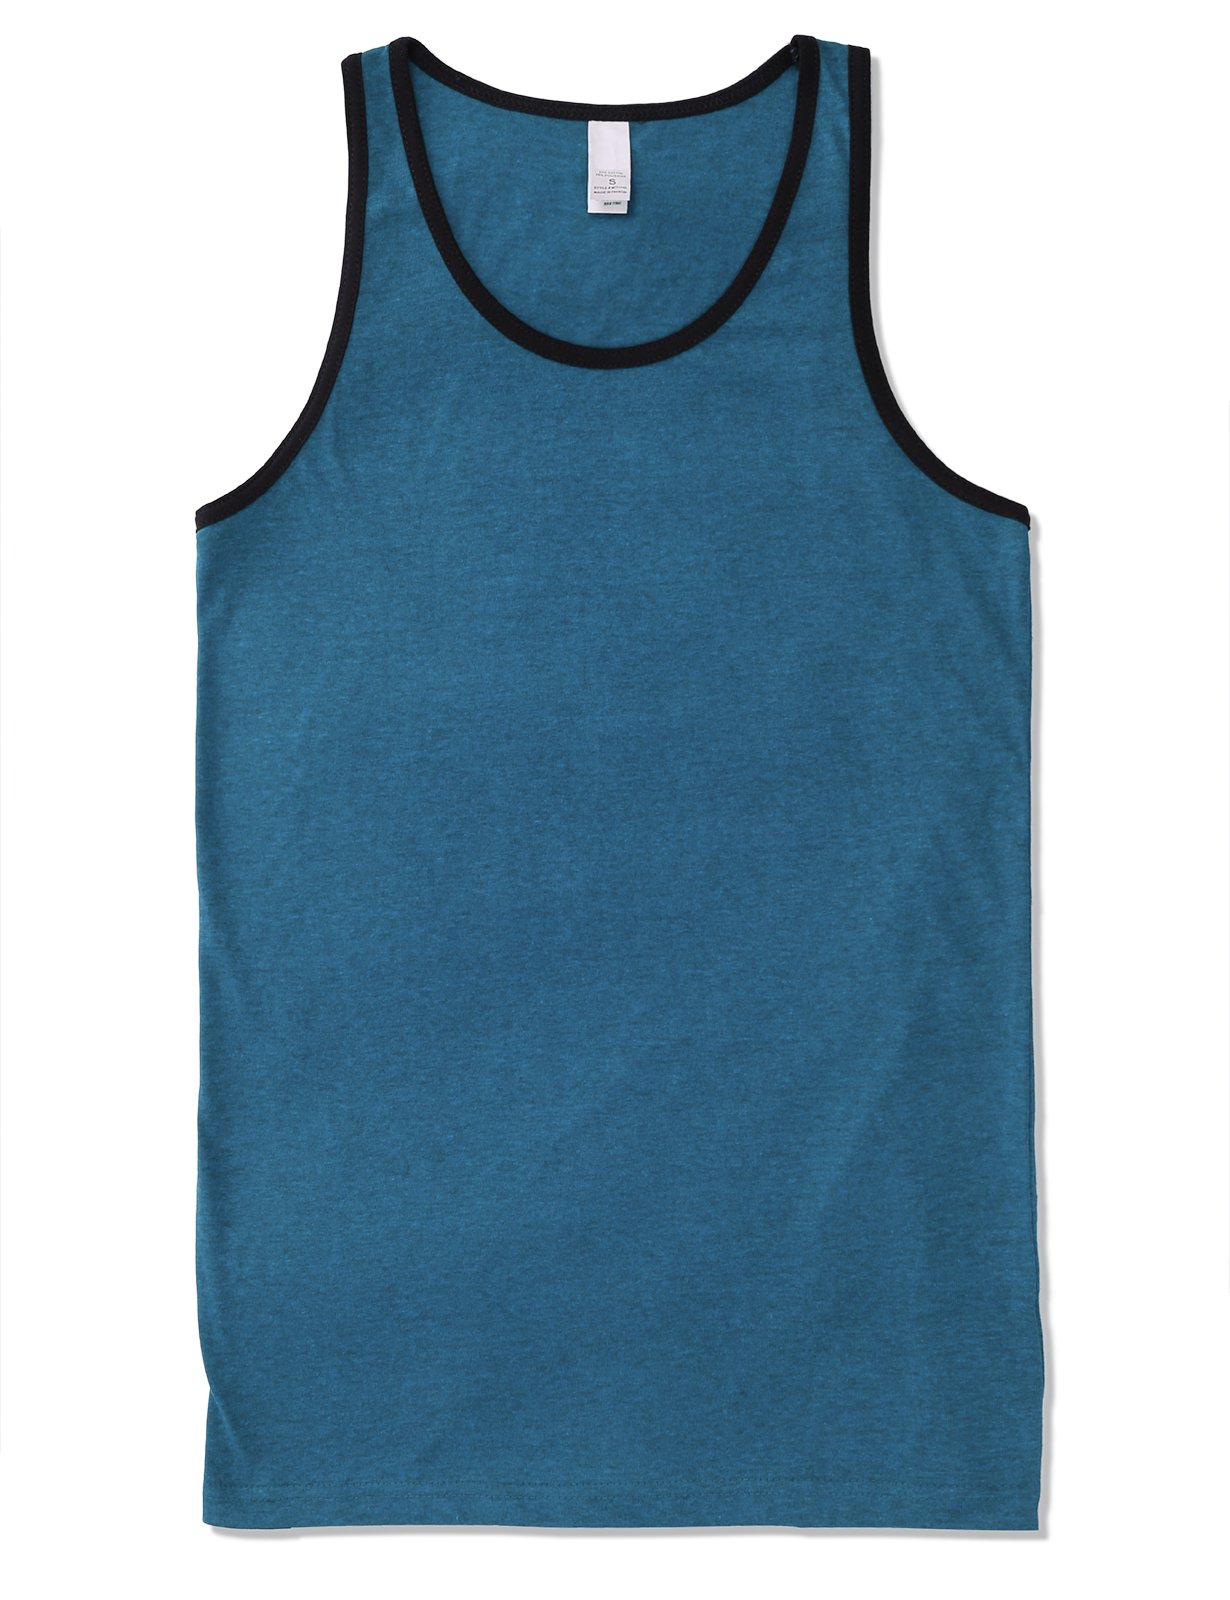 aa3fcb9720f7f7 JD Apparel Mens Men s Basic Athletic Jersey Tank Top Contrast Binding 2XL  Turquoise Black